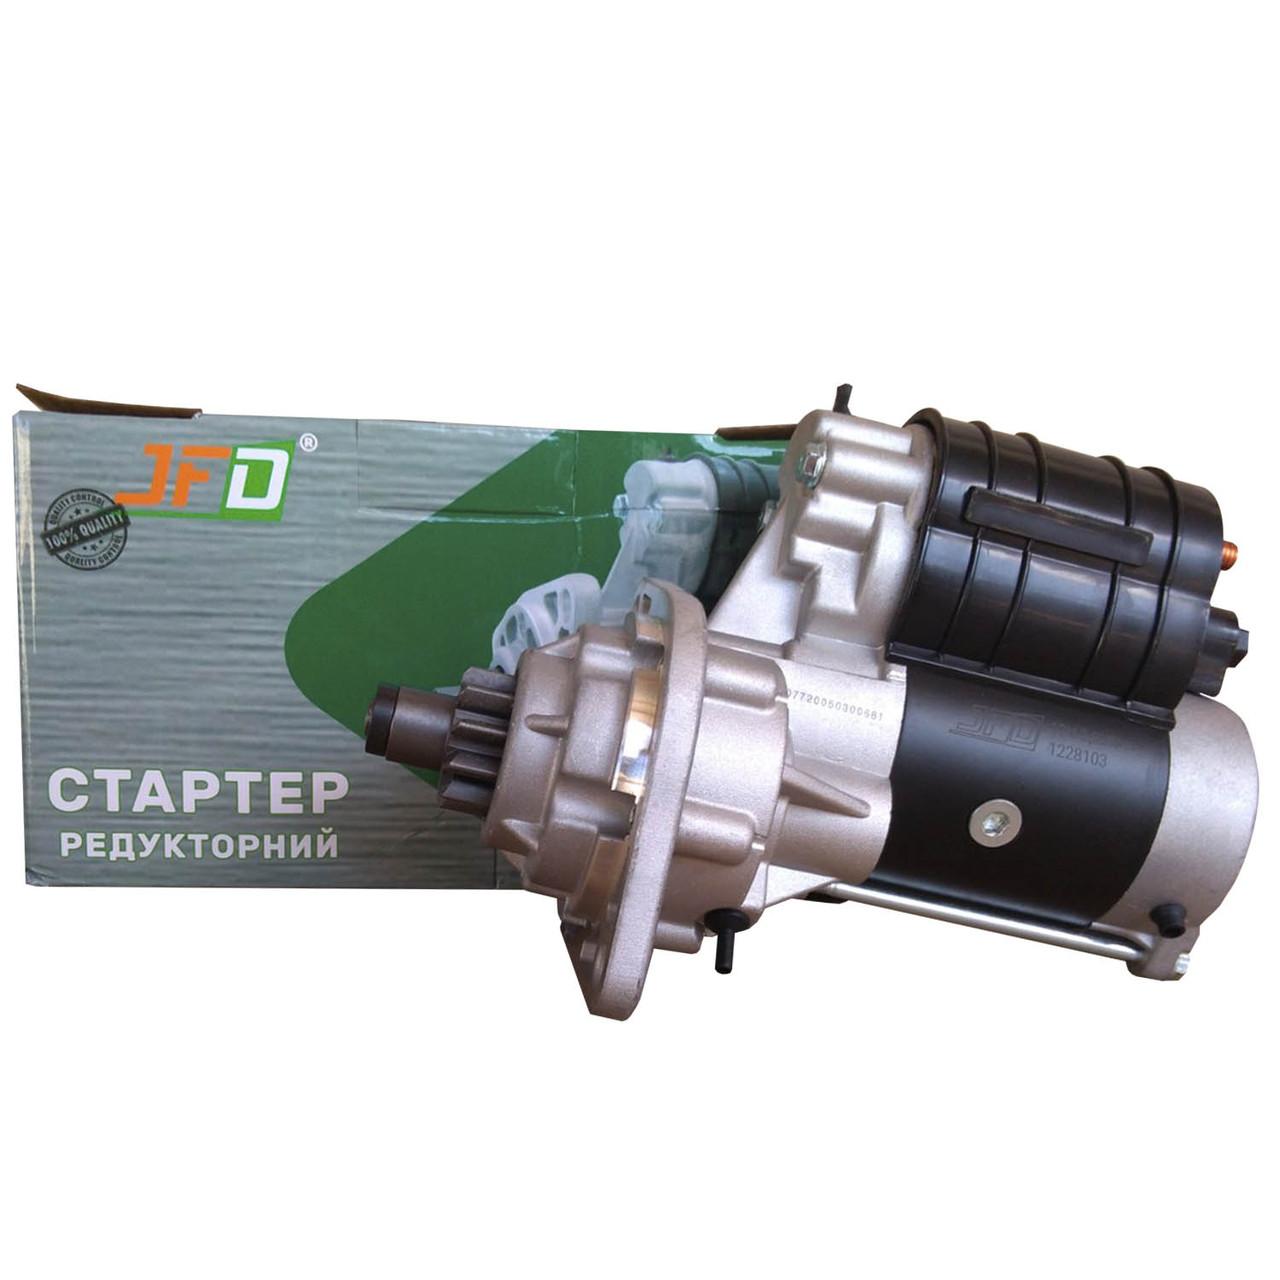 Стартер редукторний BALKANCAR (БАЛКАНКАР) JFD 12В 2,8 кВт арт. 1228103 (аналог Jubana 123708103)